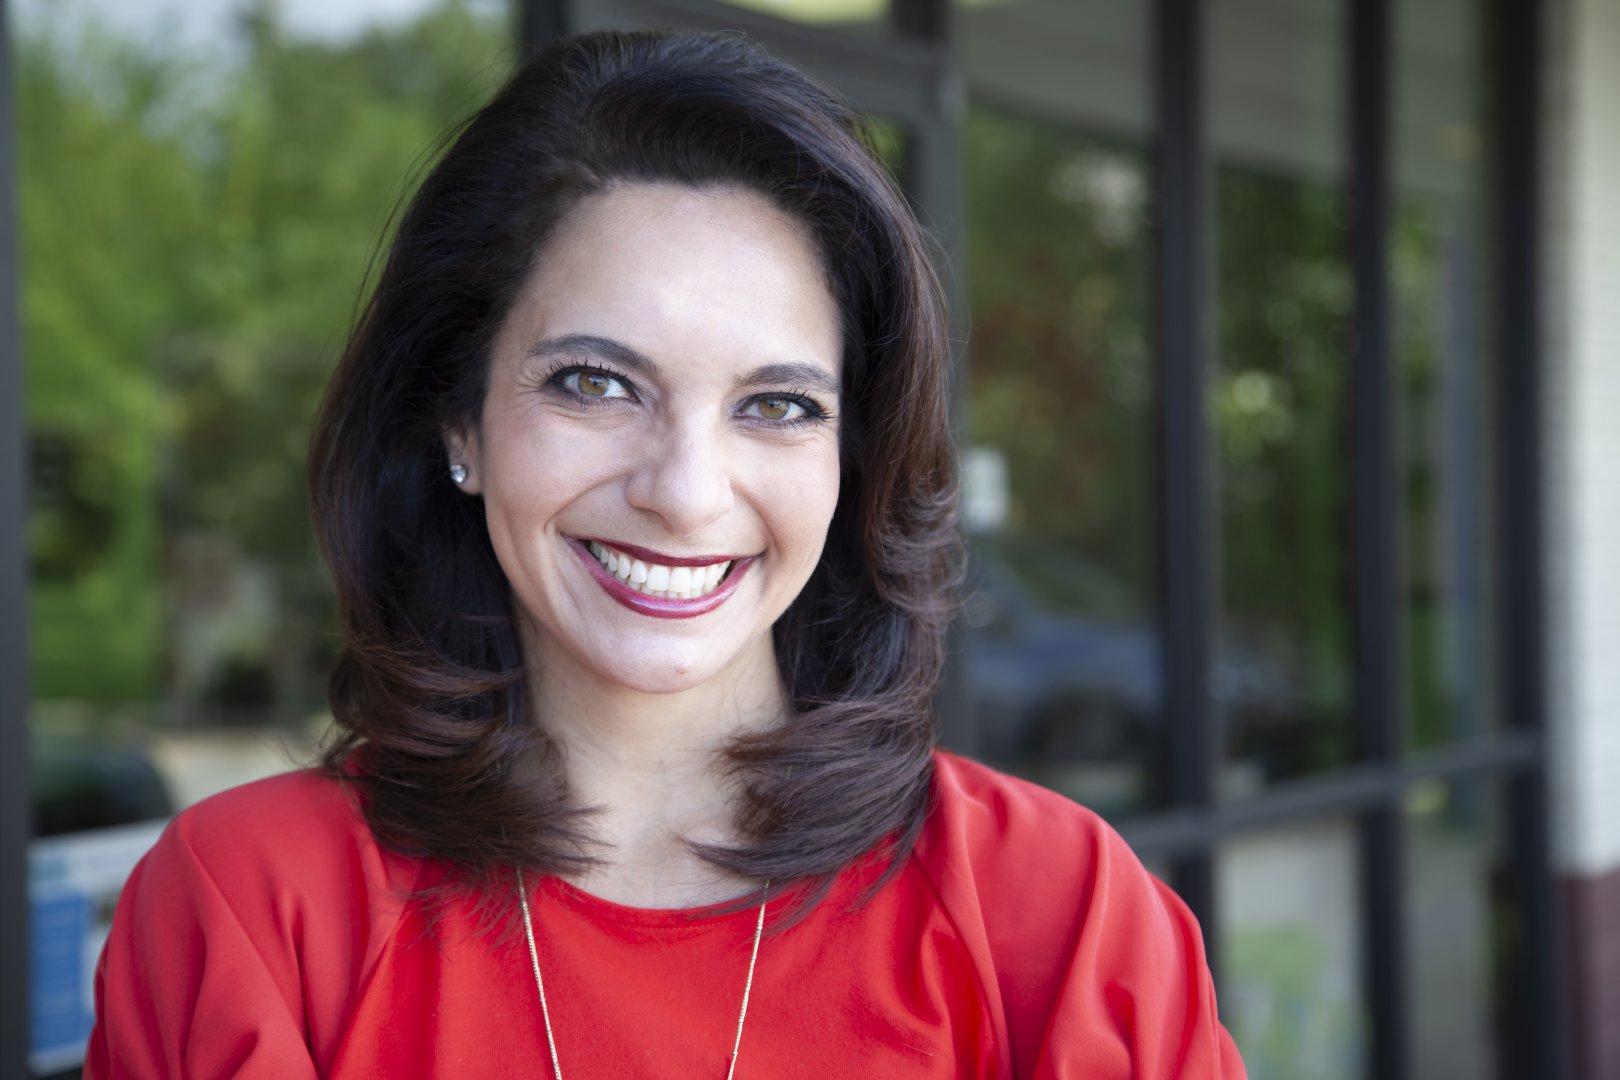 Christina Muñoz Madsen